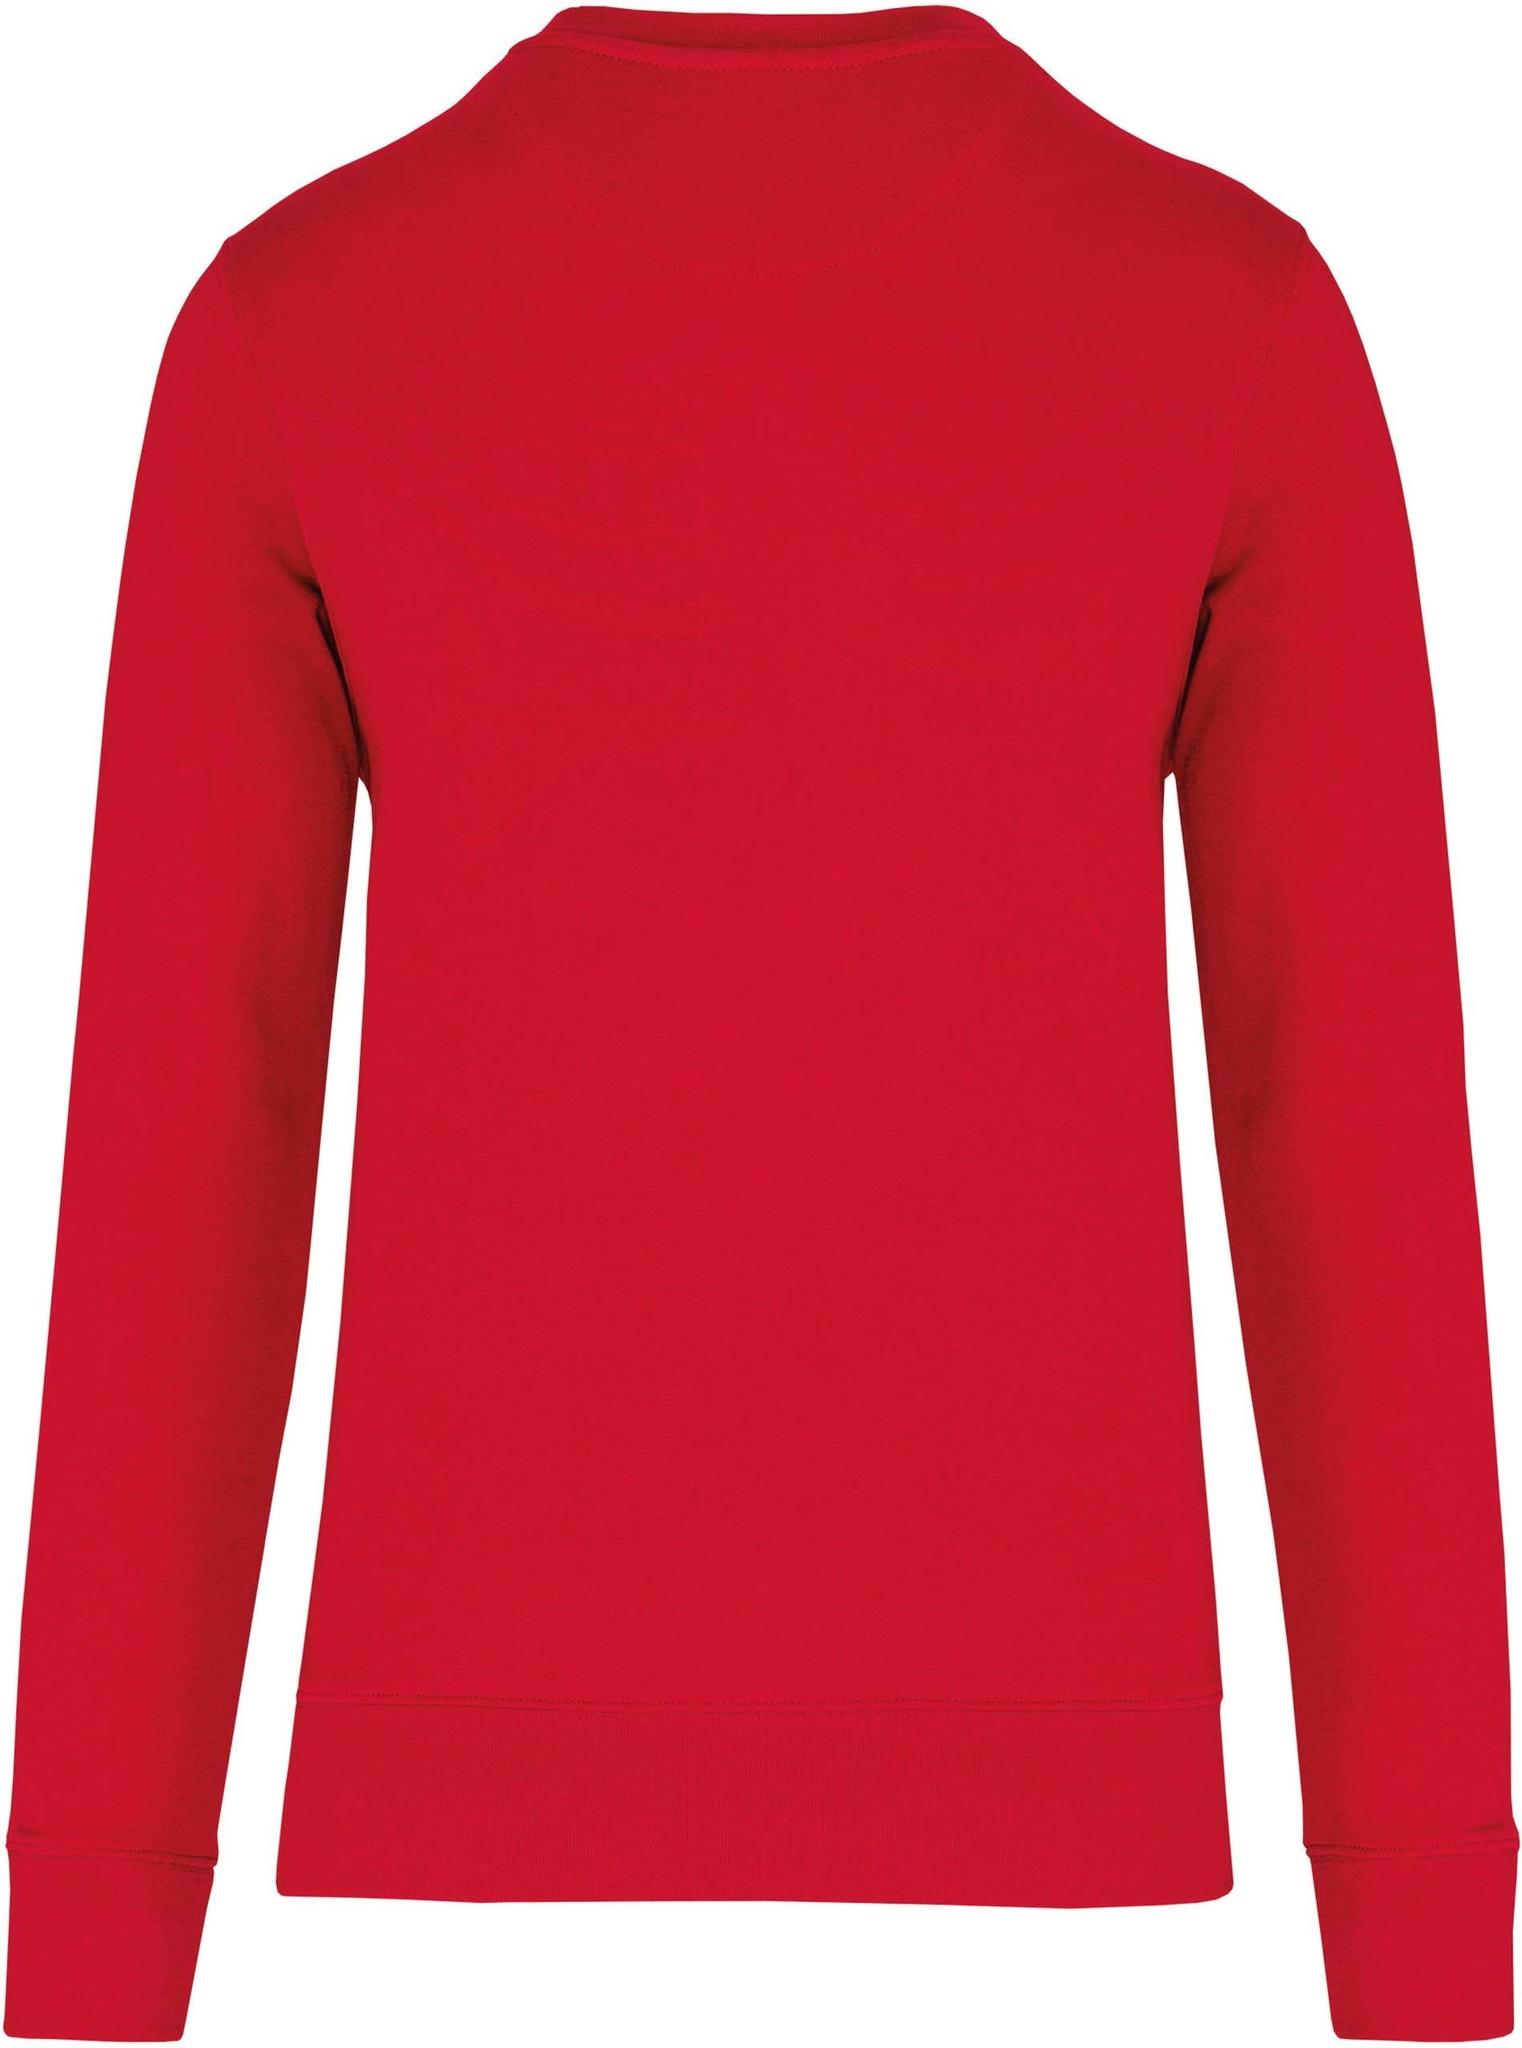 Eco-Friendly Crew Neck Sweater Kids-Red